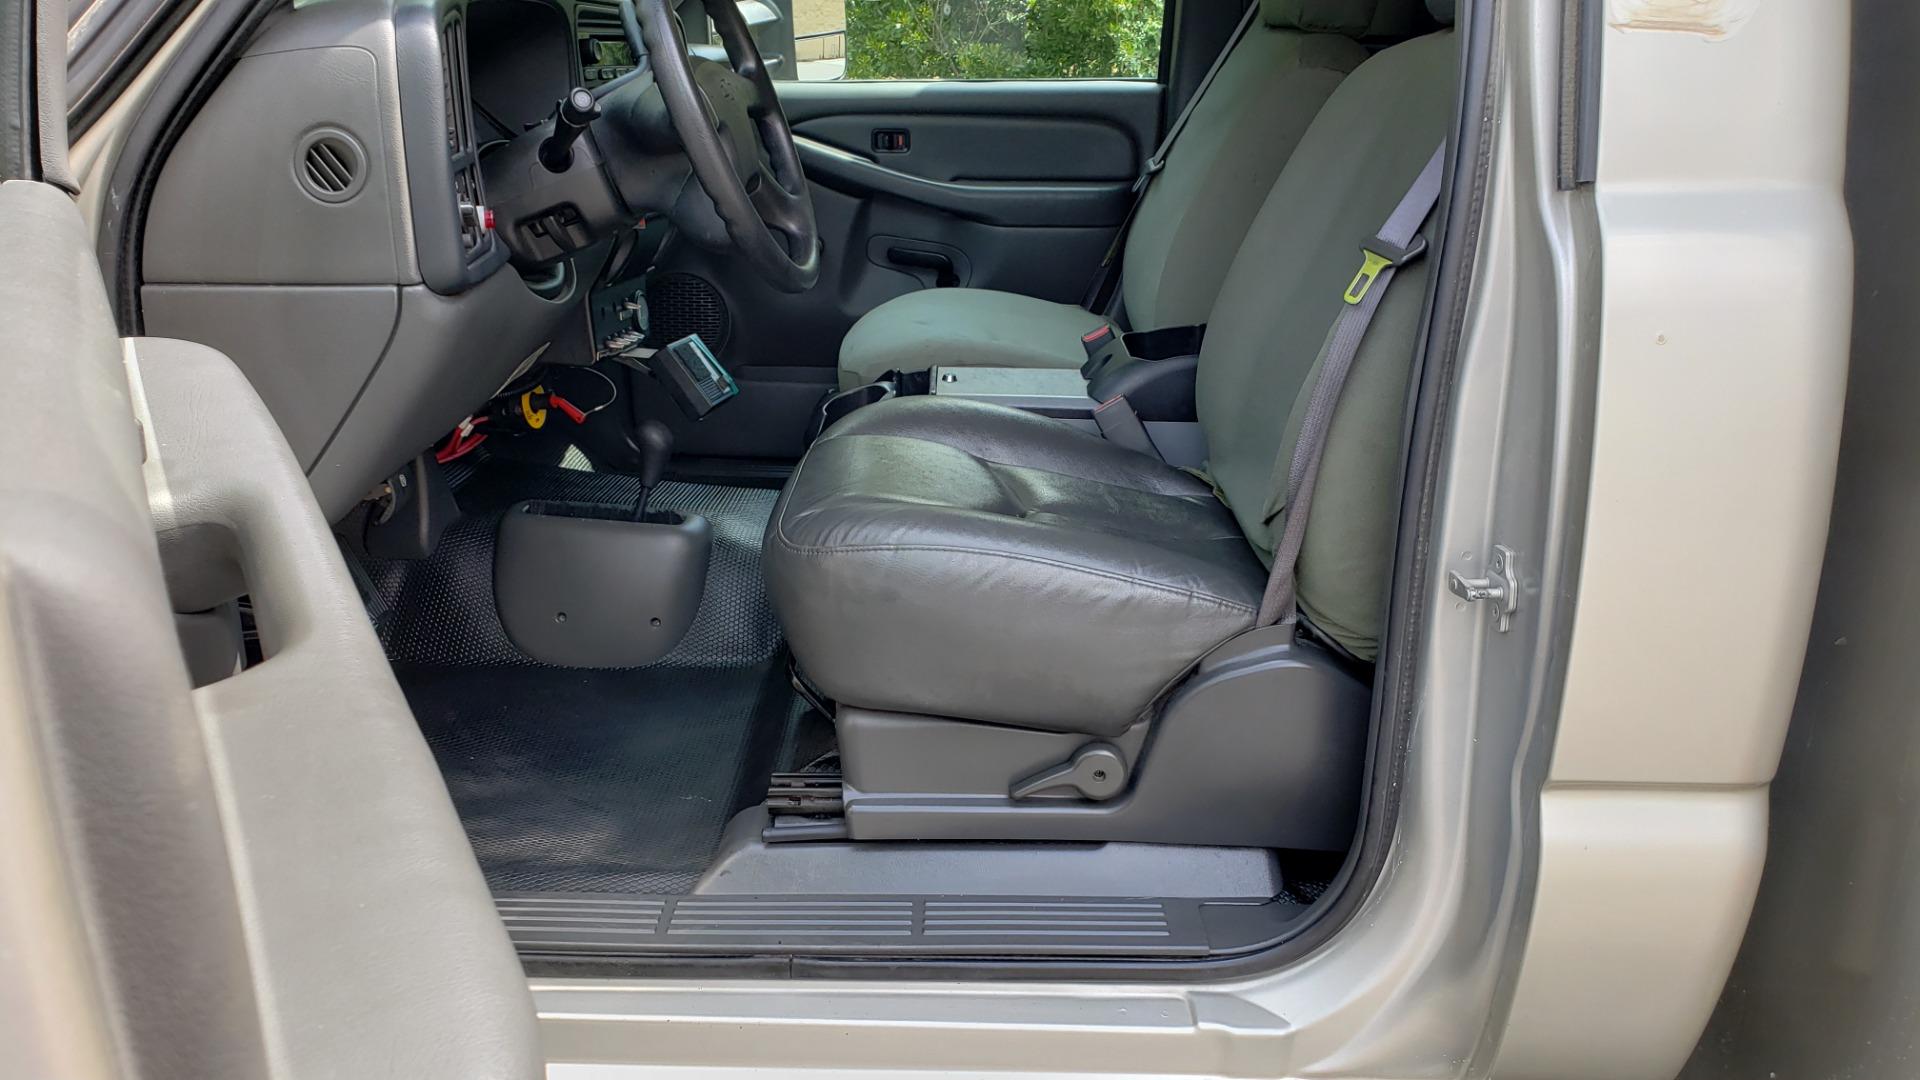 Used 2005 Chevrolet SILVERADO 3500 DRW / 4WD / REG CAB / 6.6L DURAMAX / DOOMSDAY PREPPER for sale $21,595 at Formula Imports in Charlotte NC 28227 34